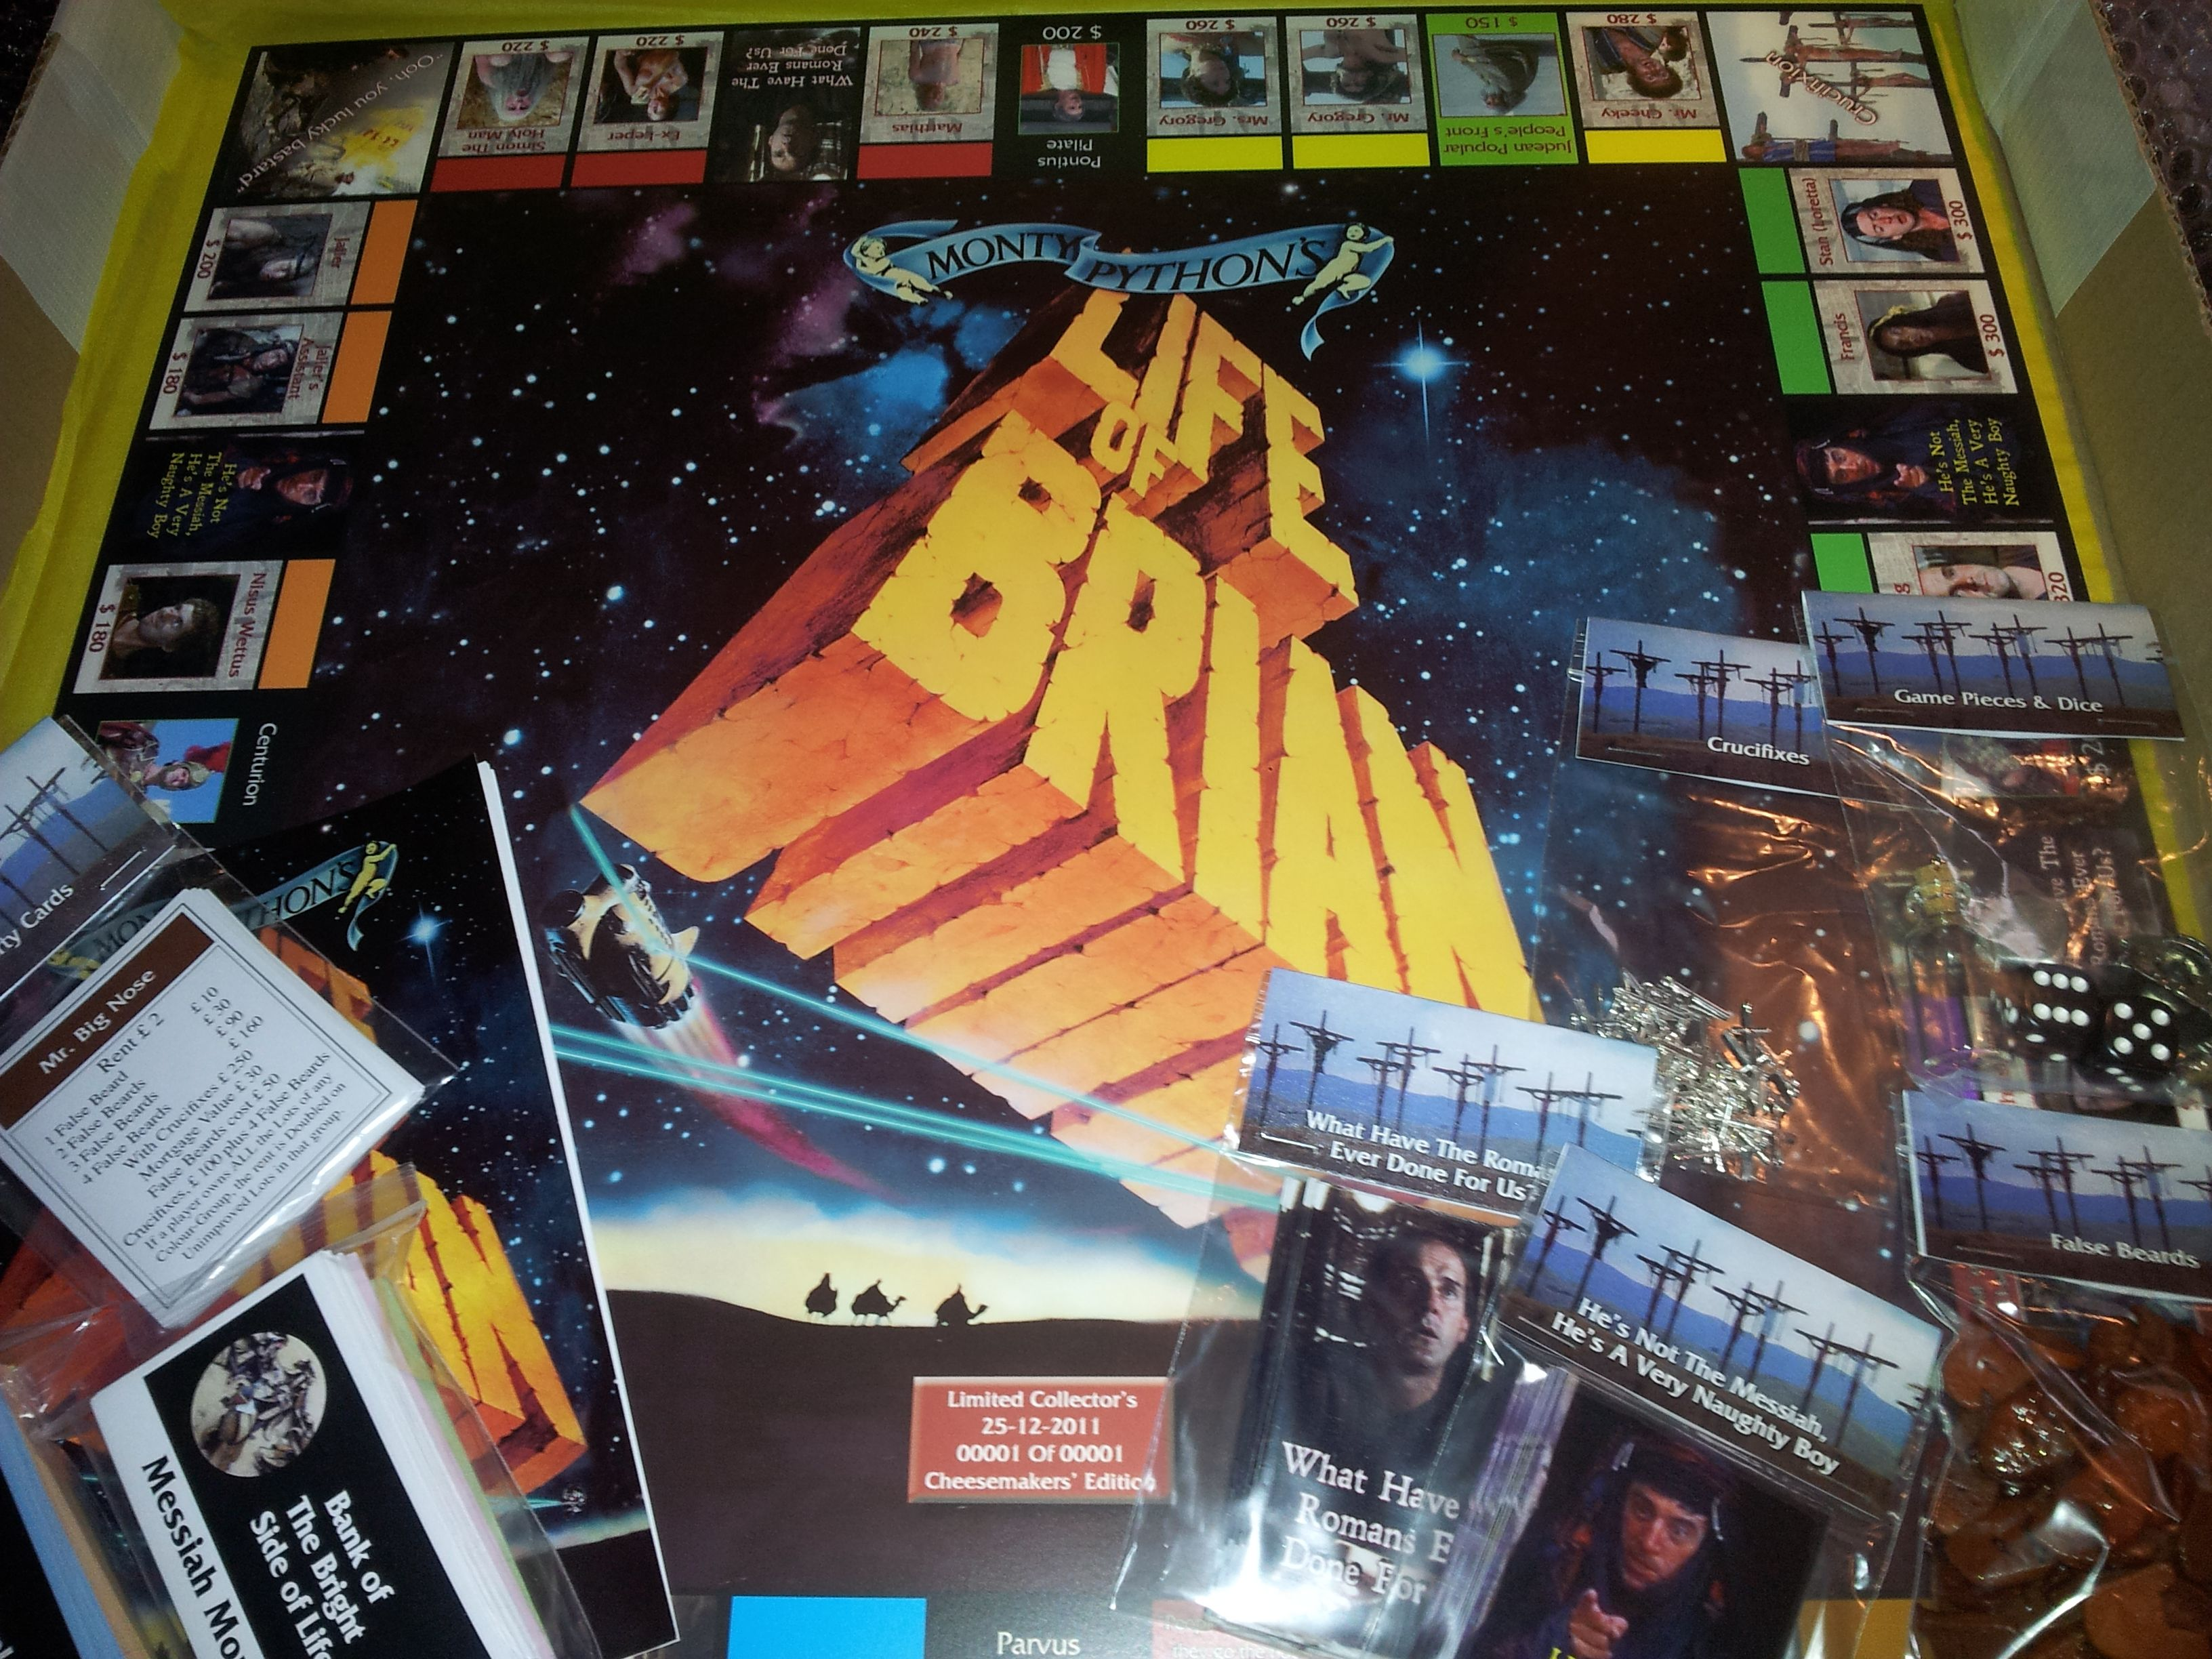 Monty Python's Life of Brian board. Fimo 'false beards